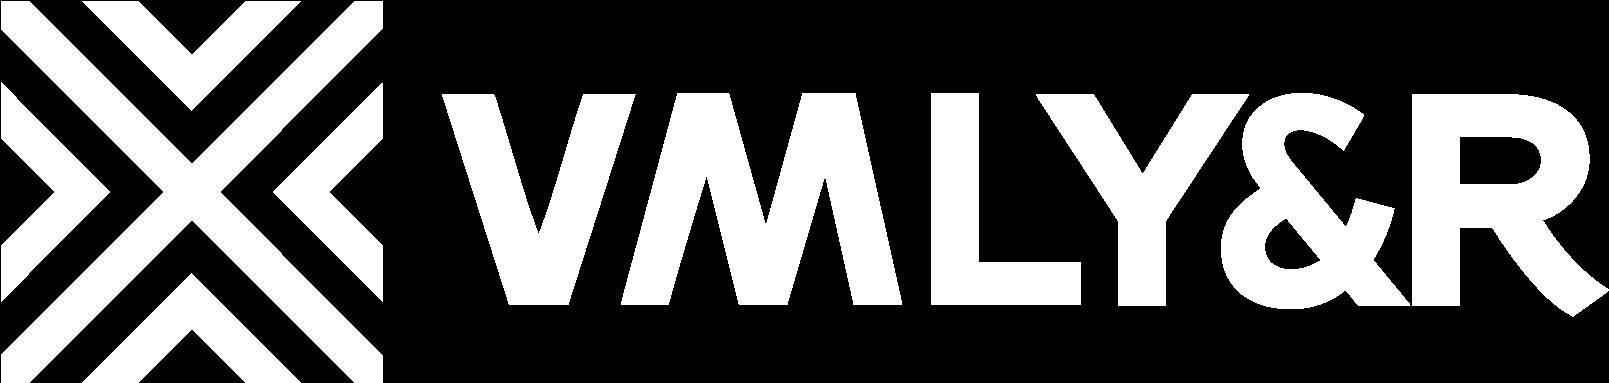 266-2669246_vmly-r-logo.png